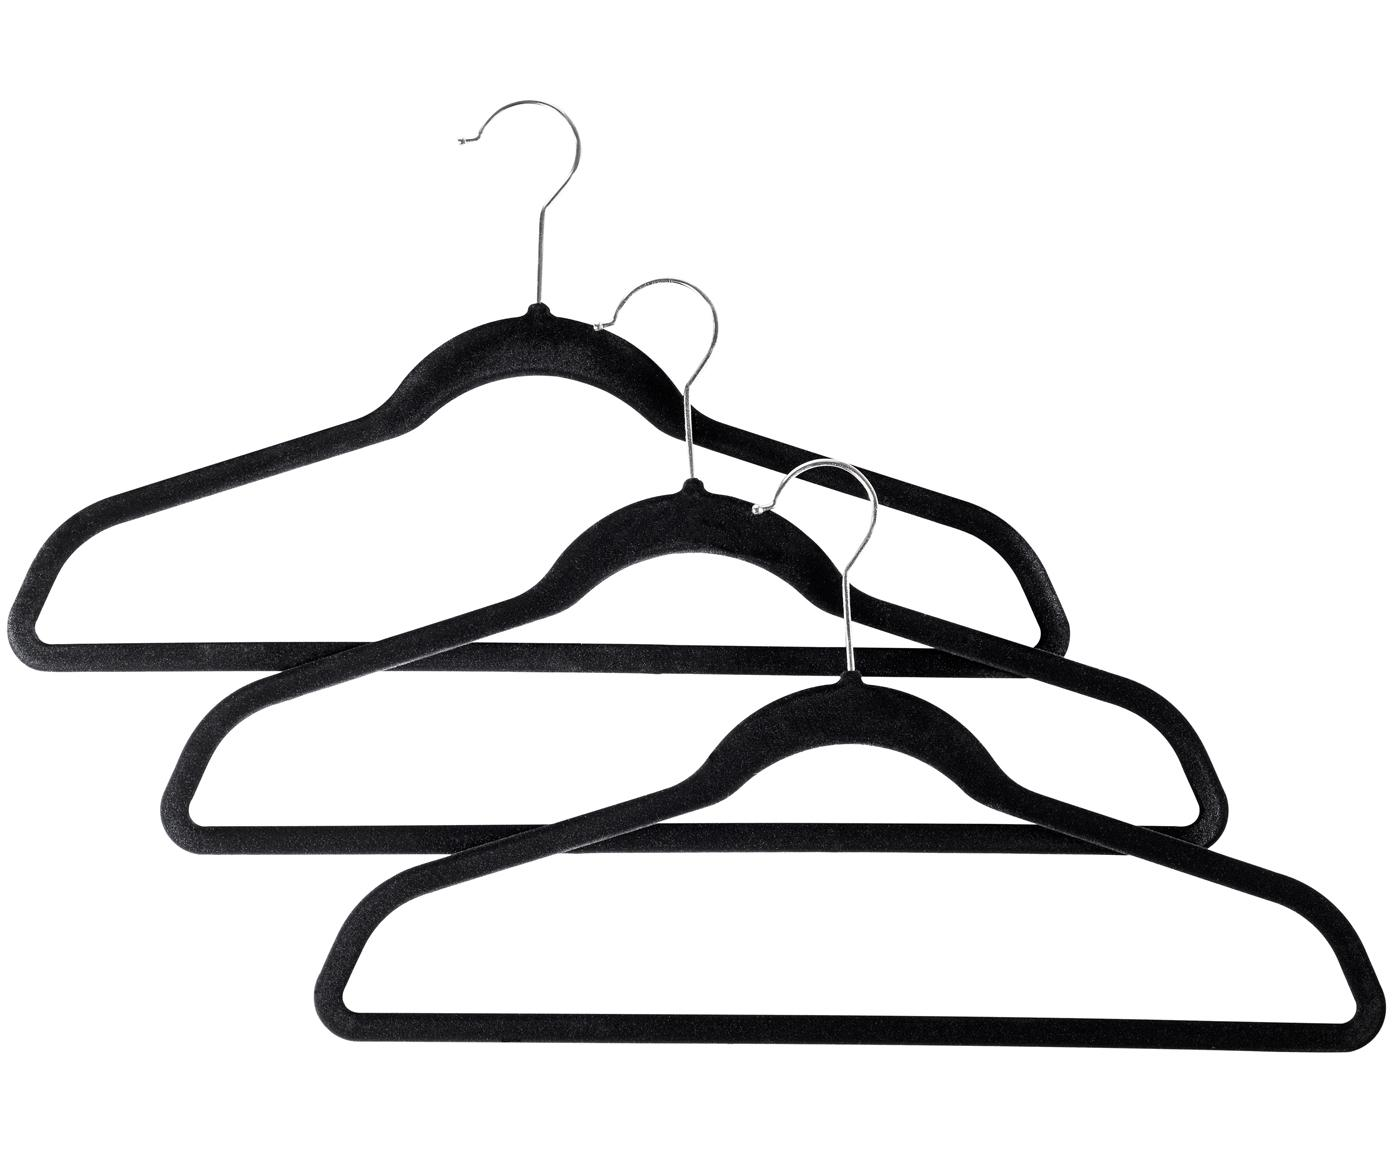 Kleiderbügel Black Velvet, 12 Stück, Haken: Metall, Bezug: Nylonbeflockung, Schwarz, 45 x 25 cm